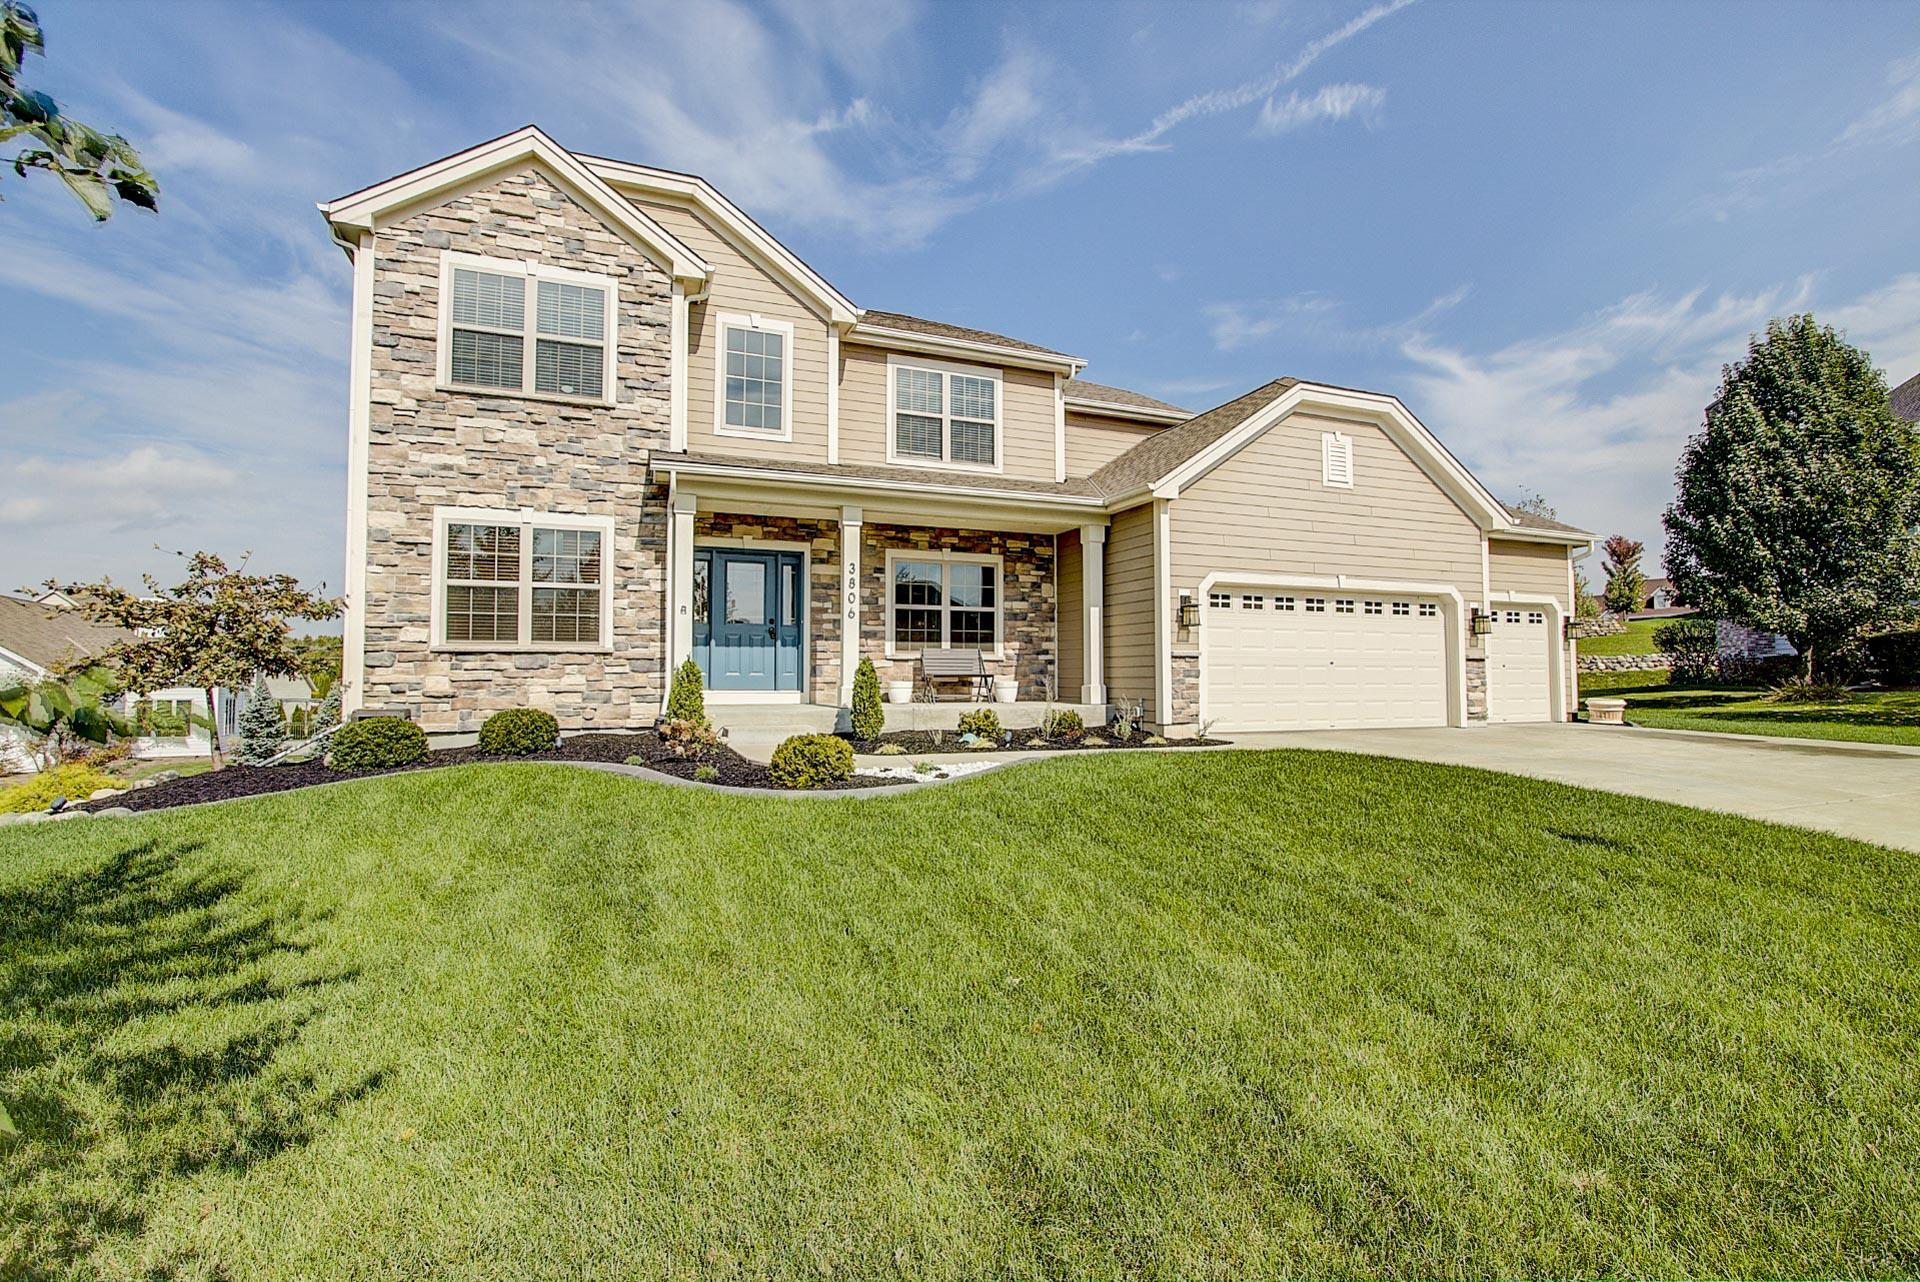 3806 Woodland TRL, Waukesha, Wisconsin 53188, 4 Bedrooms Bedrooms, ,2 BathroomsBathrooms,Single-Family,For Sale,Woodland TRL,1609929